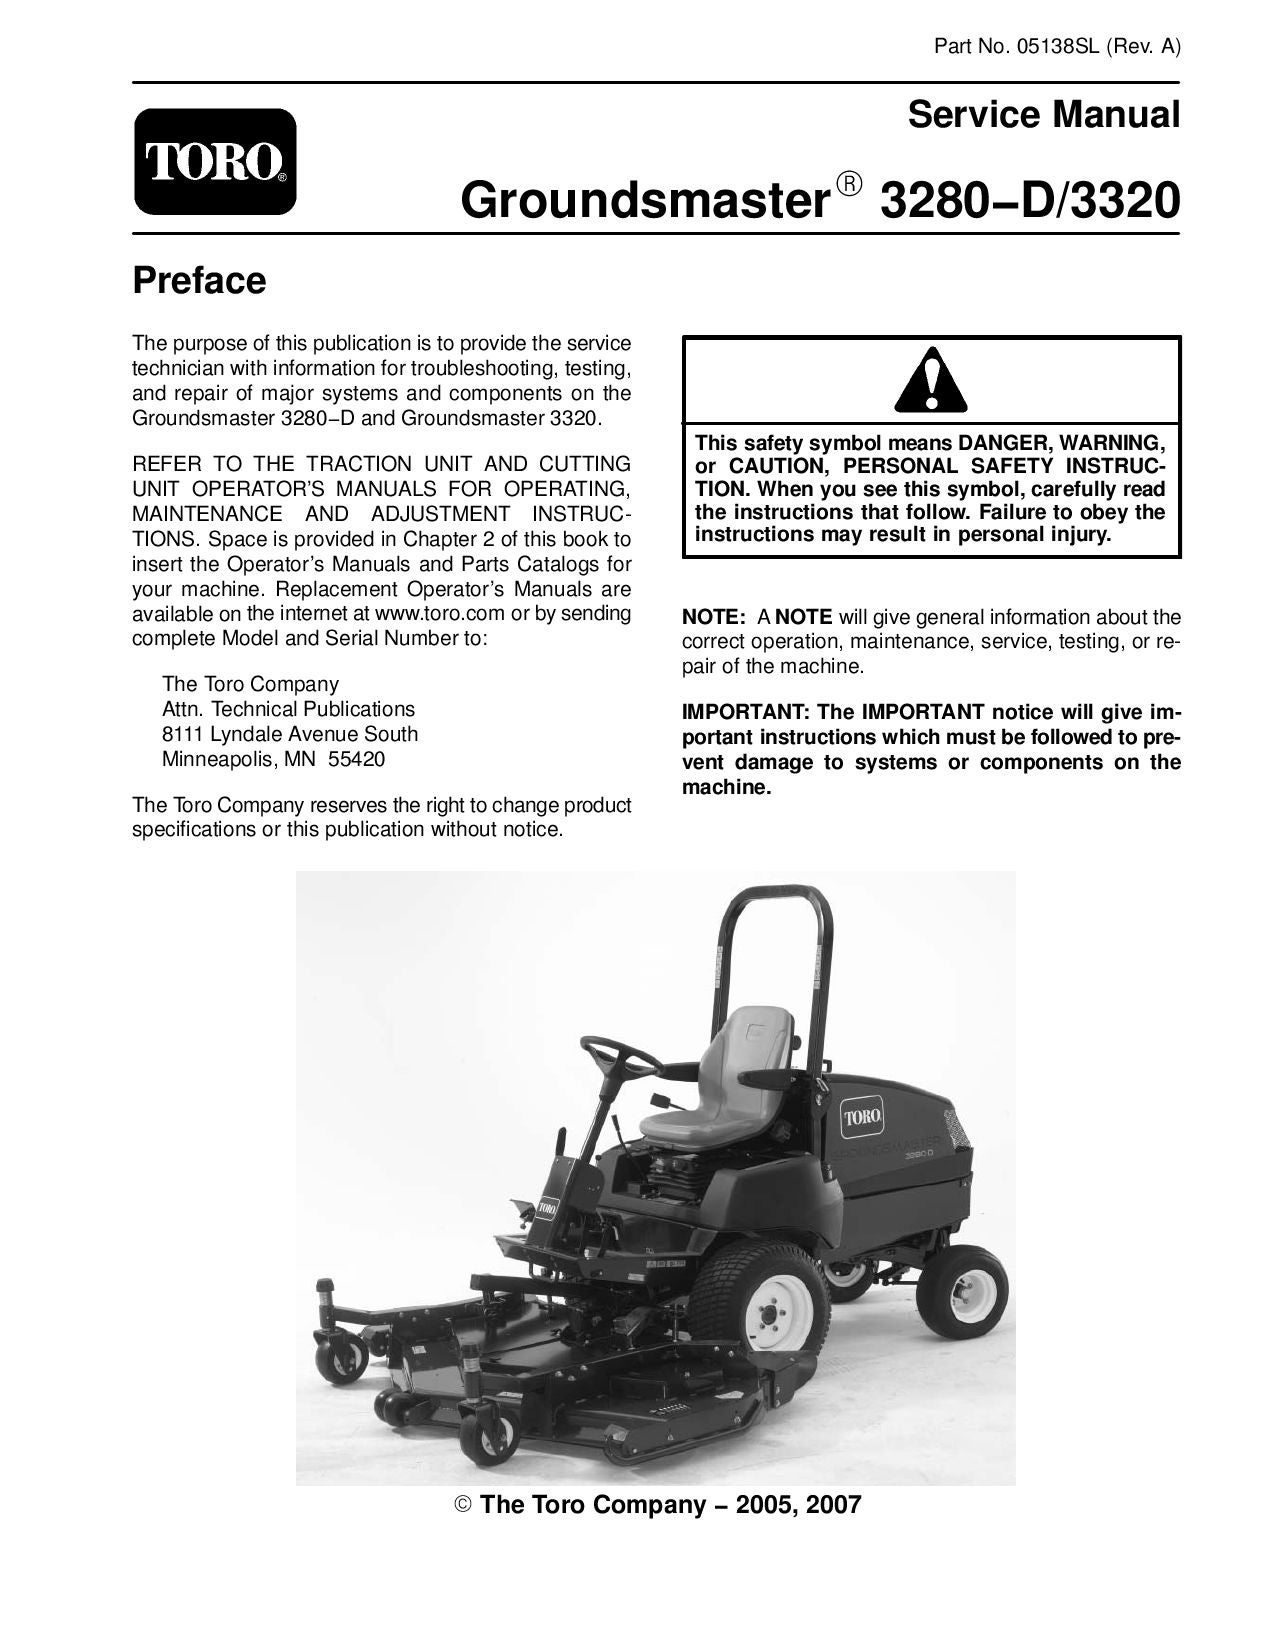 05138sl pdf Groundsmaster 3280-D/3320 (Rev A) Dec, 2007 by negimachi